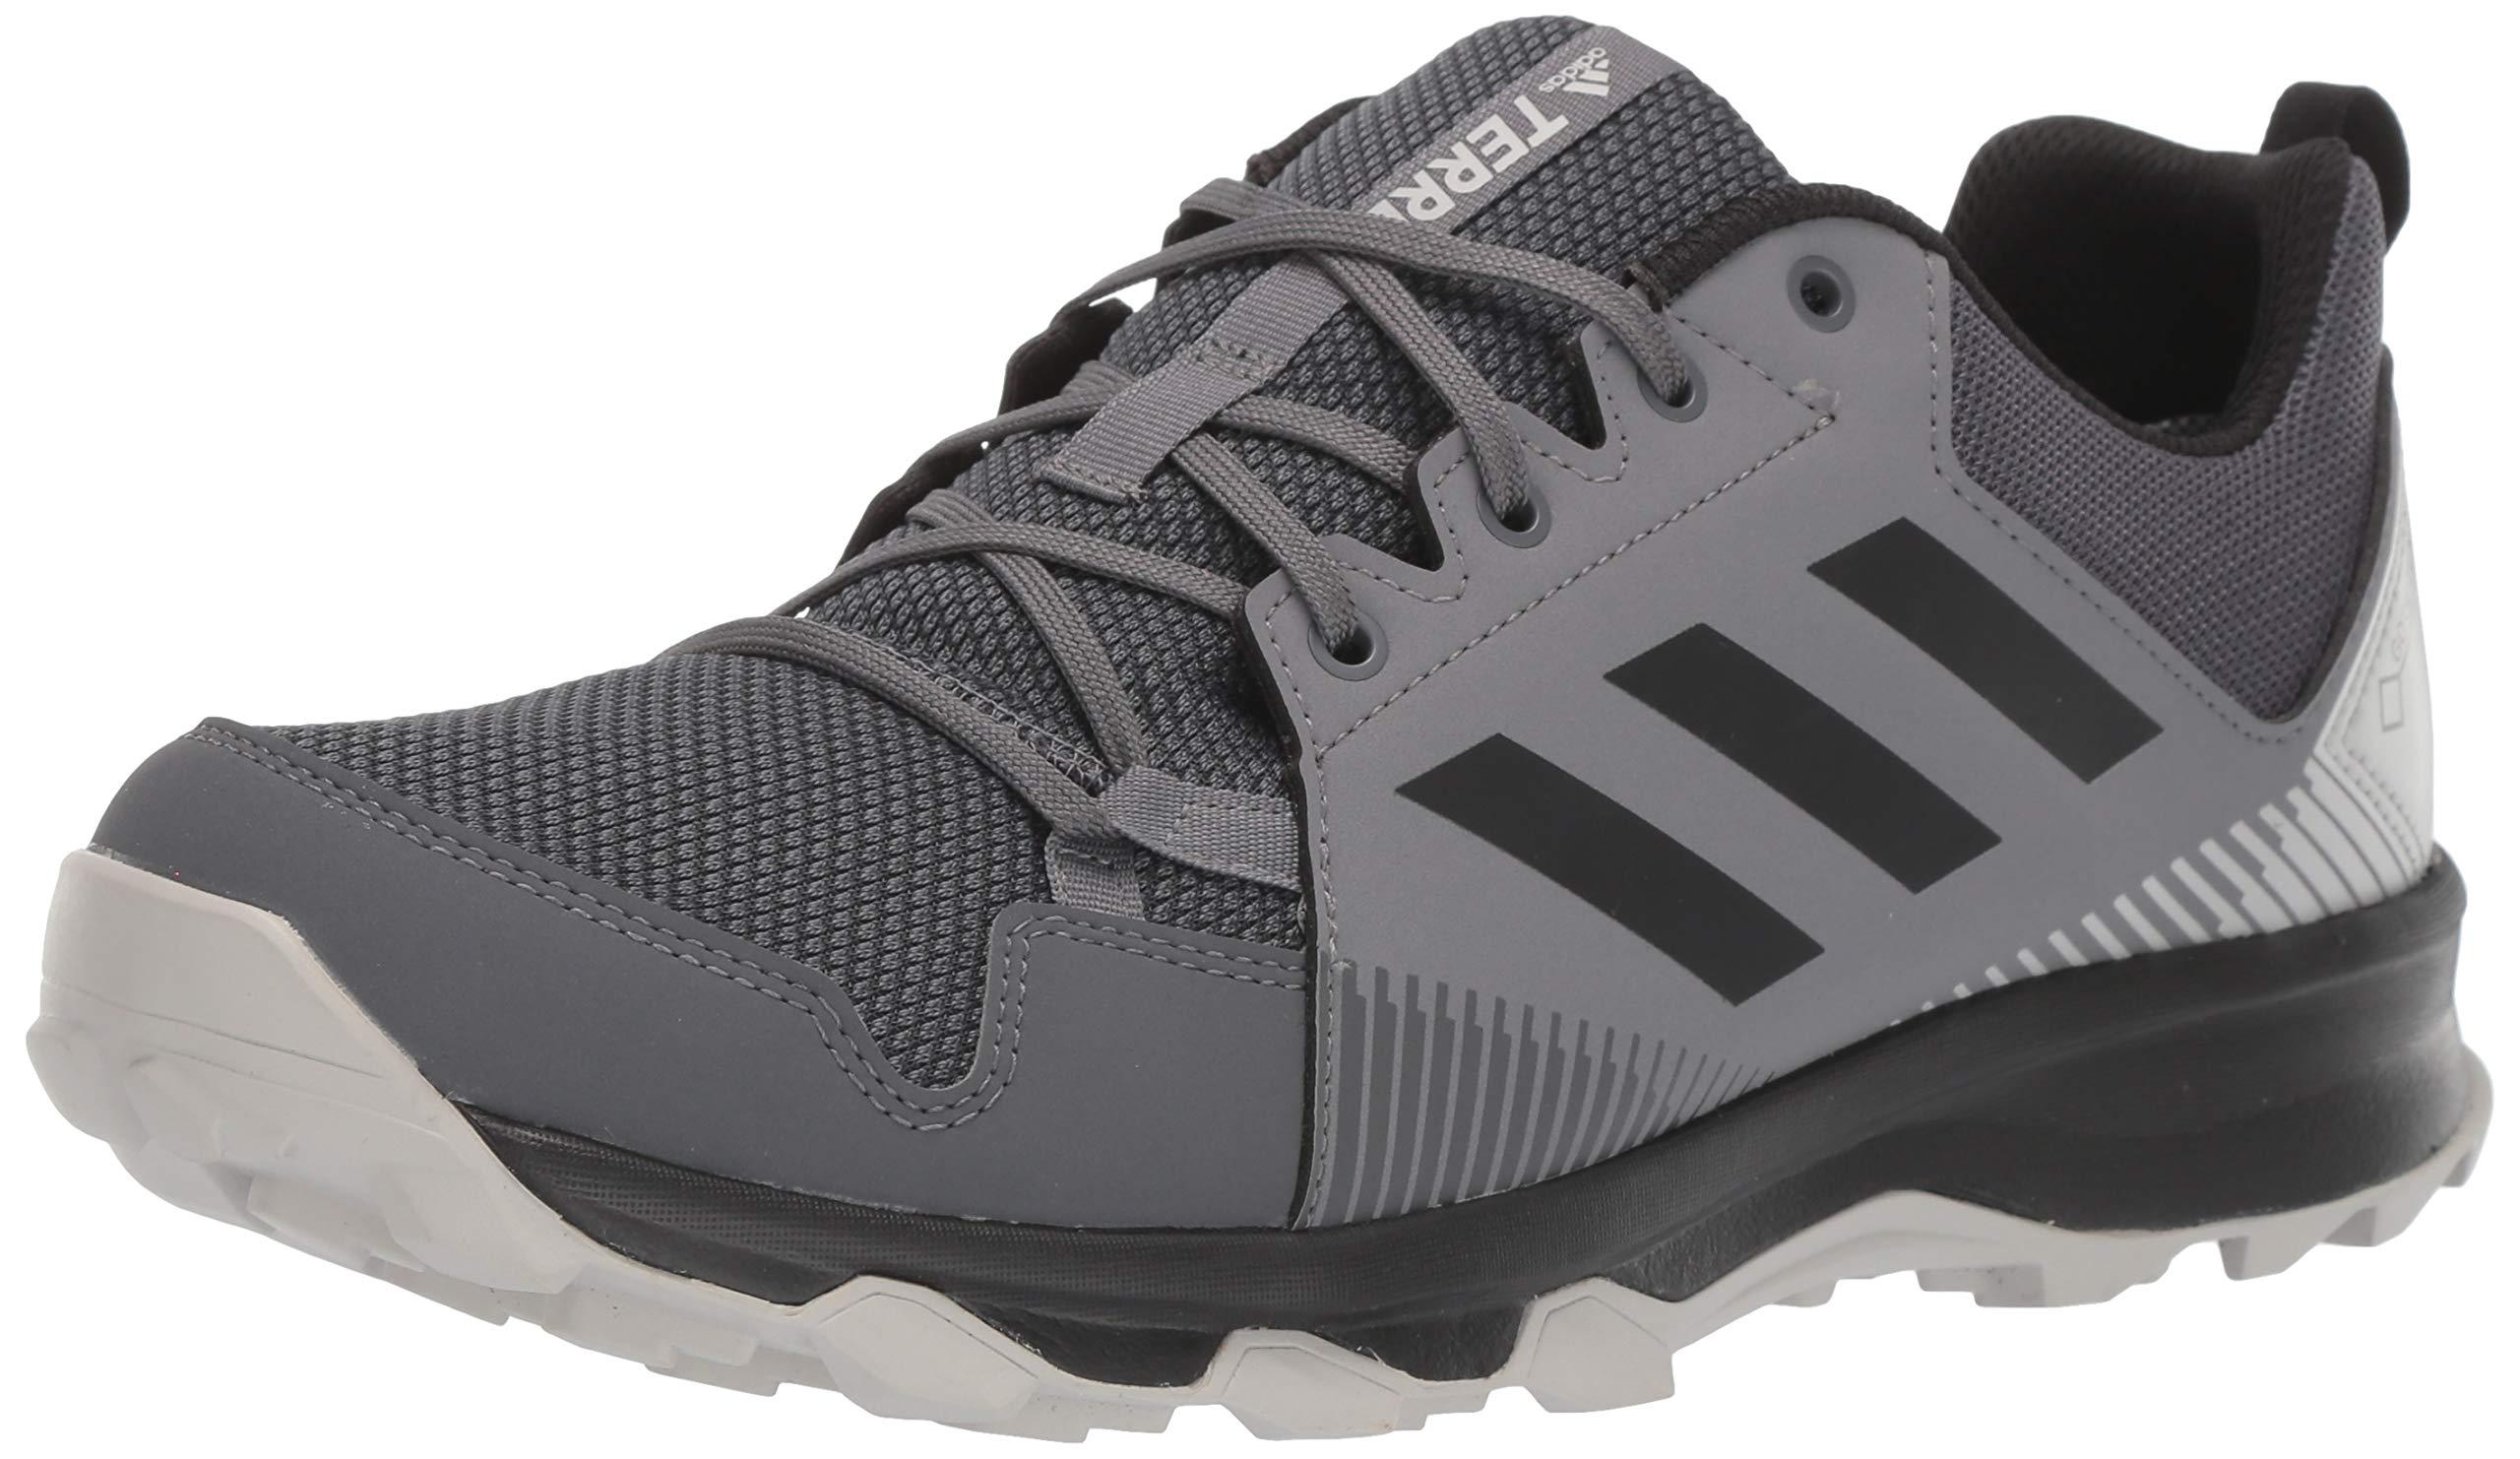 adidas outdoor Men's Terrex Tracerocker GTX Athletic Shoe